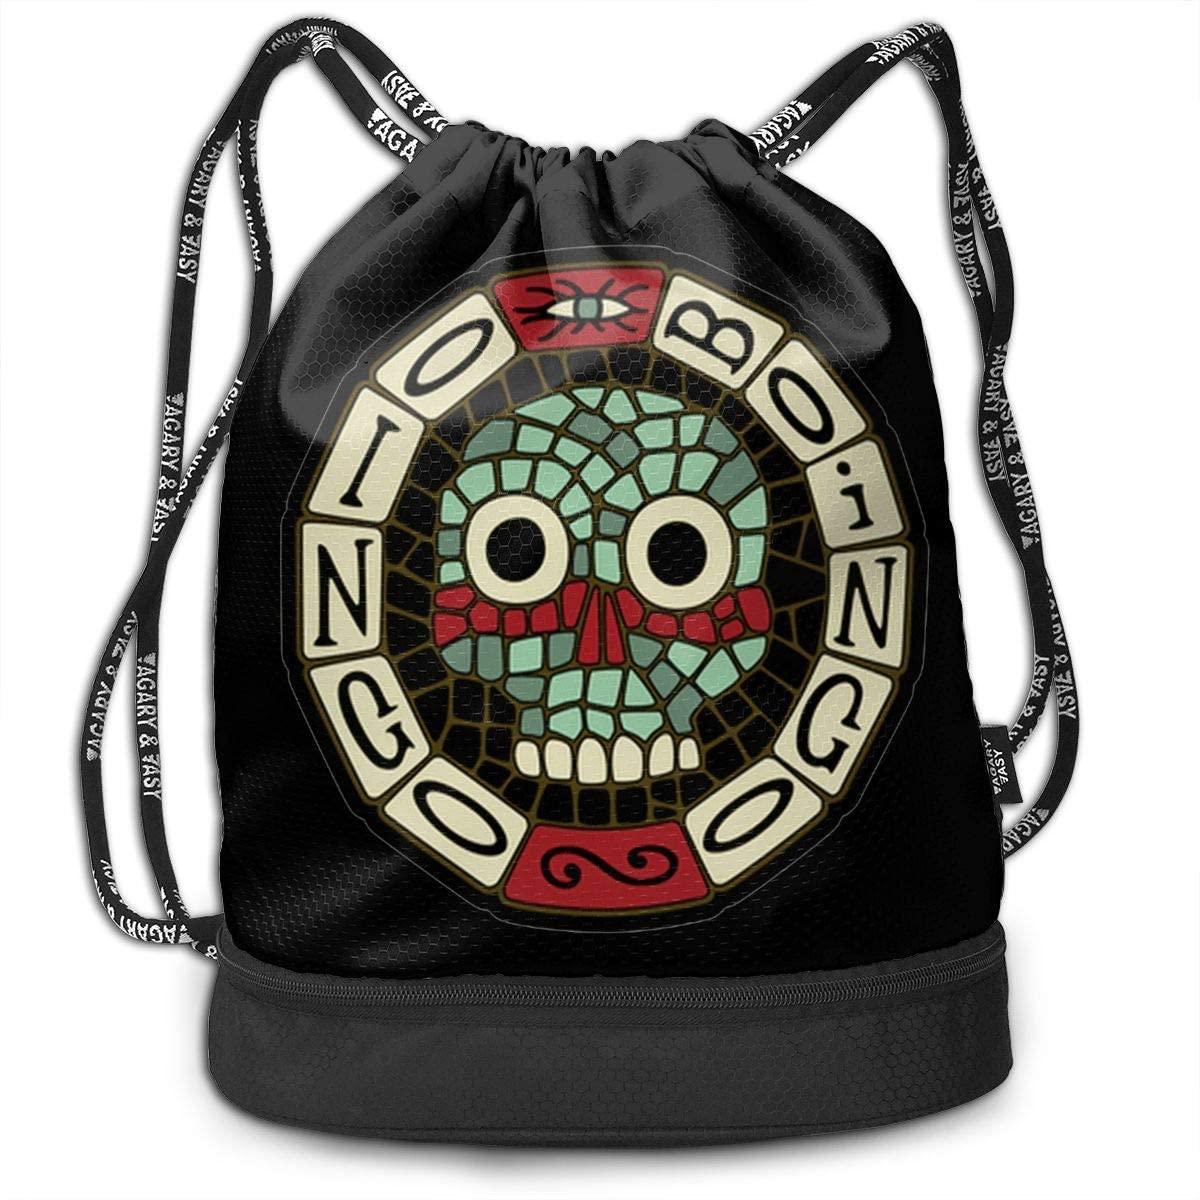 Oingo Boingo Drawstring Bag Gym Lightweight Bundle Backpack For Men Women Kids School Gym Travel